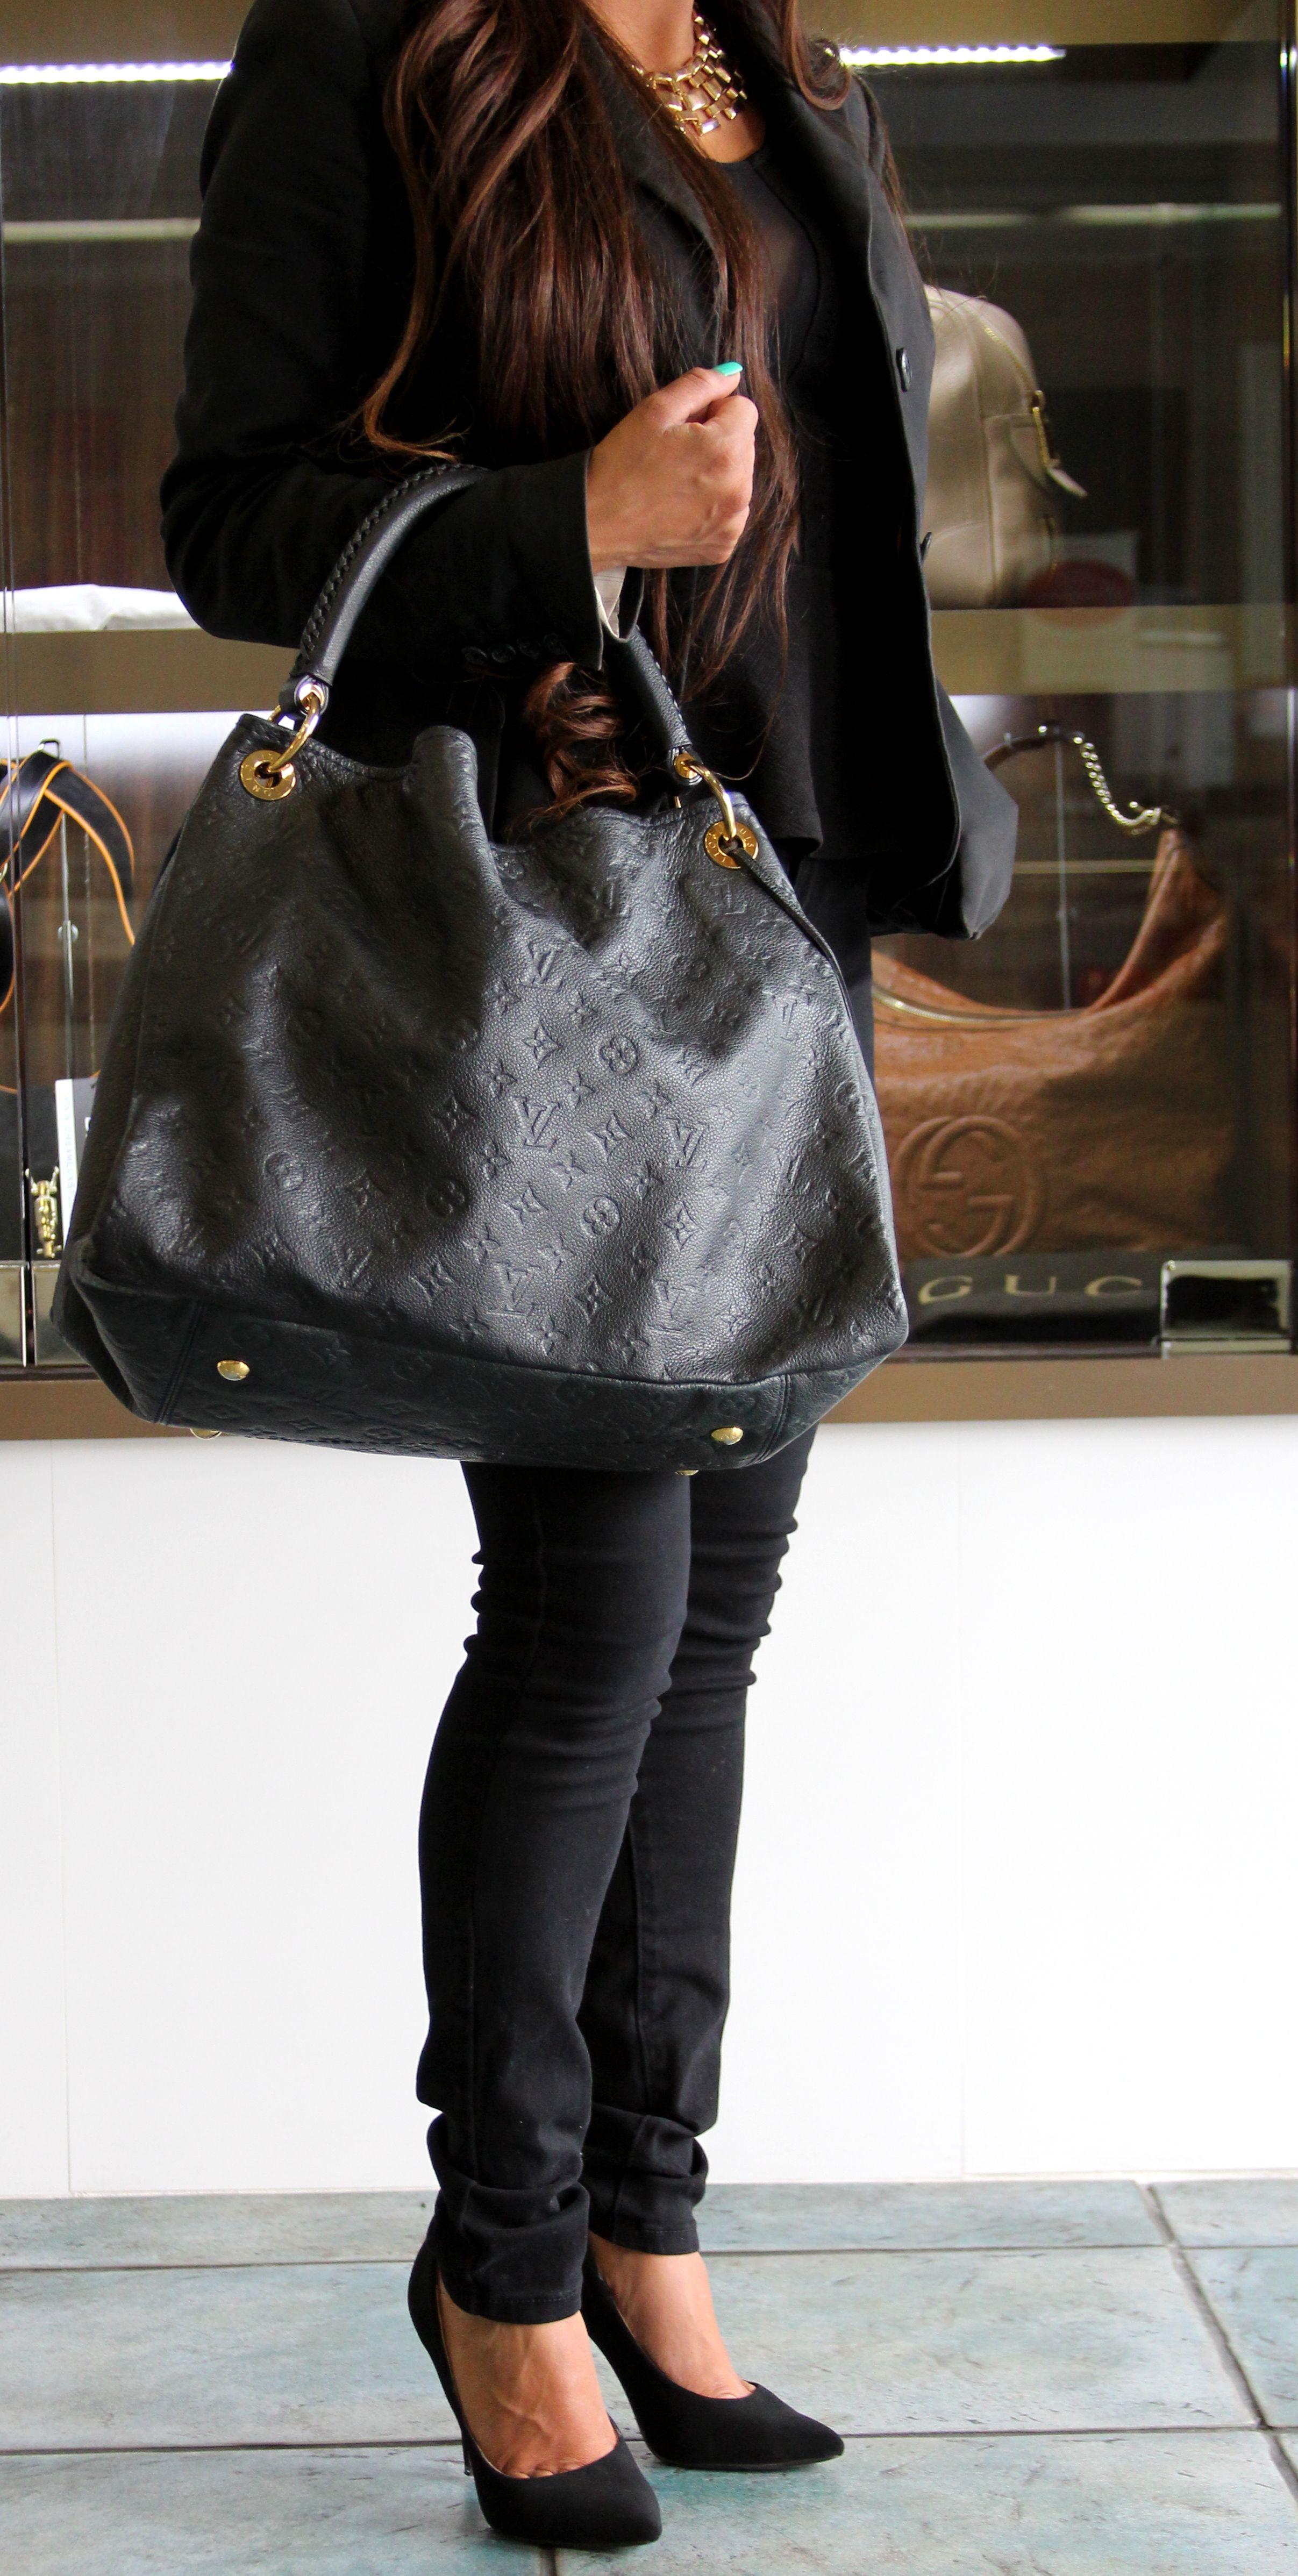 Louis Vuitton Artsy Monogram Empreinte Leather Infini. Perfect summer tote  bag!  summer  louisvuitton  fashion  style 59f0f1322a8